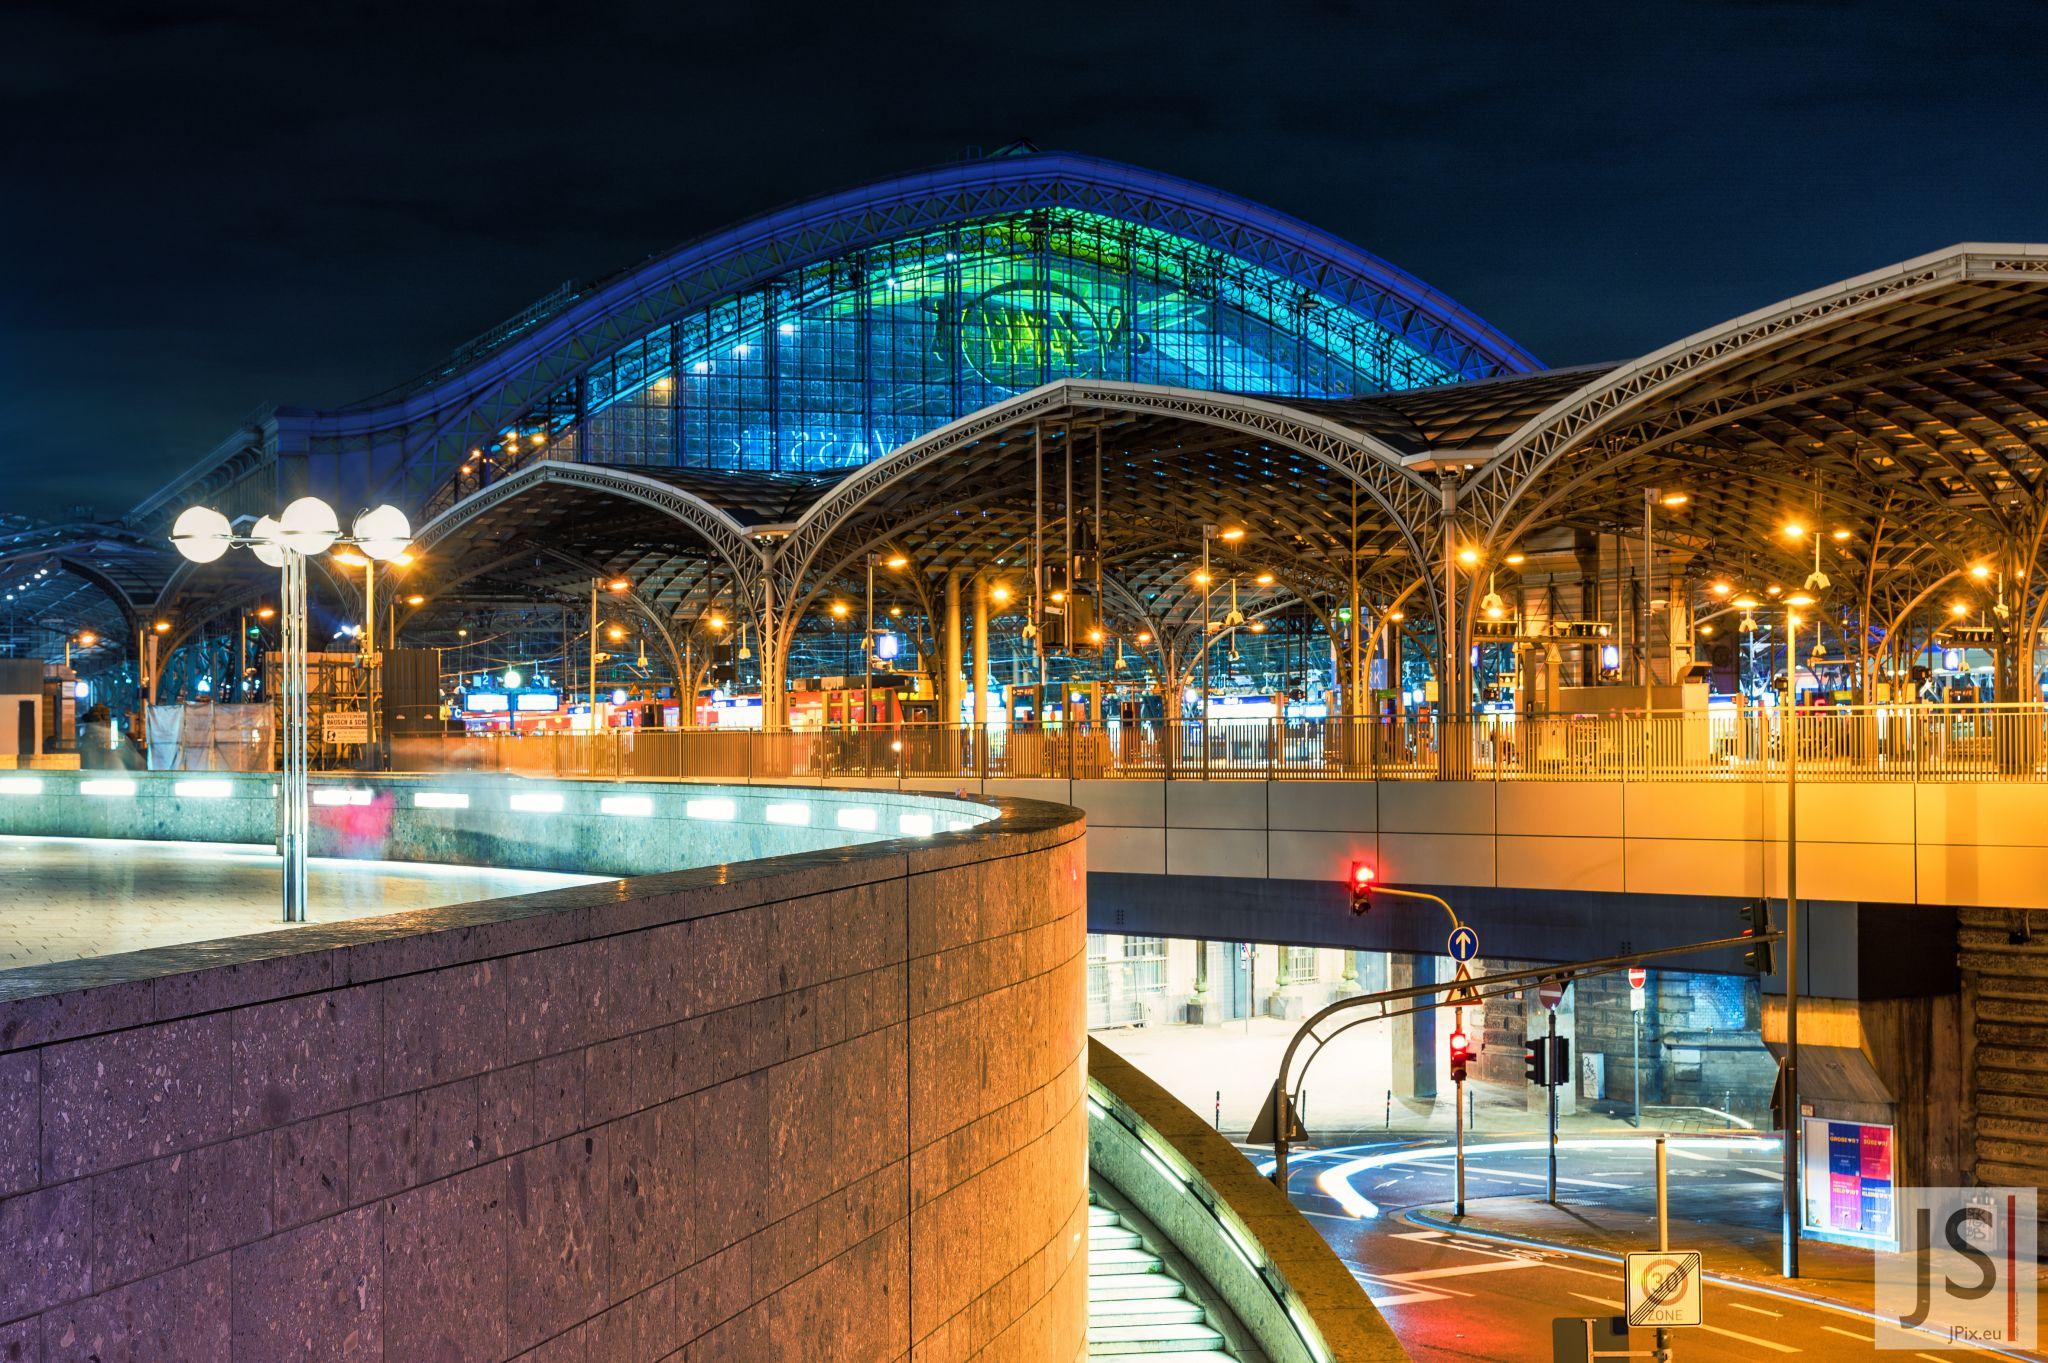 Kölner Hauptbahnhof, Germany